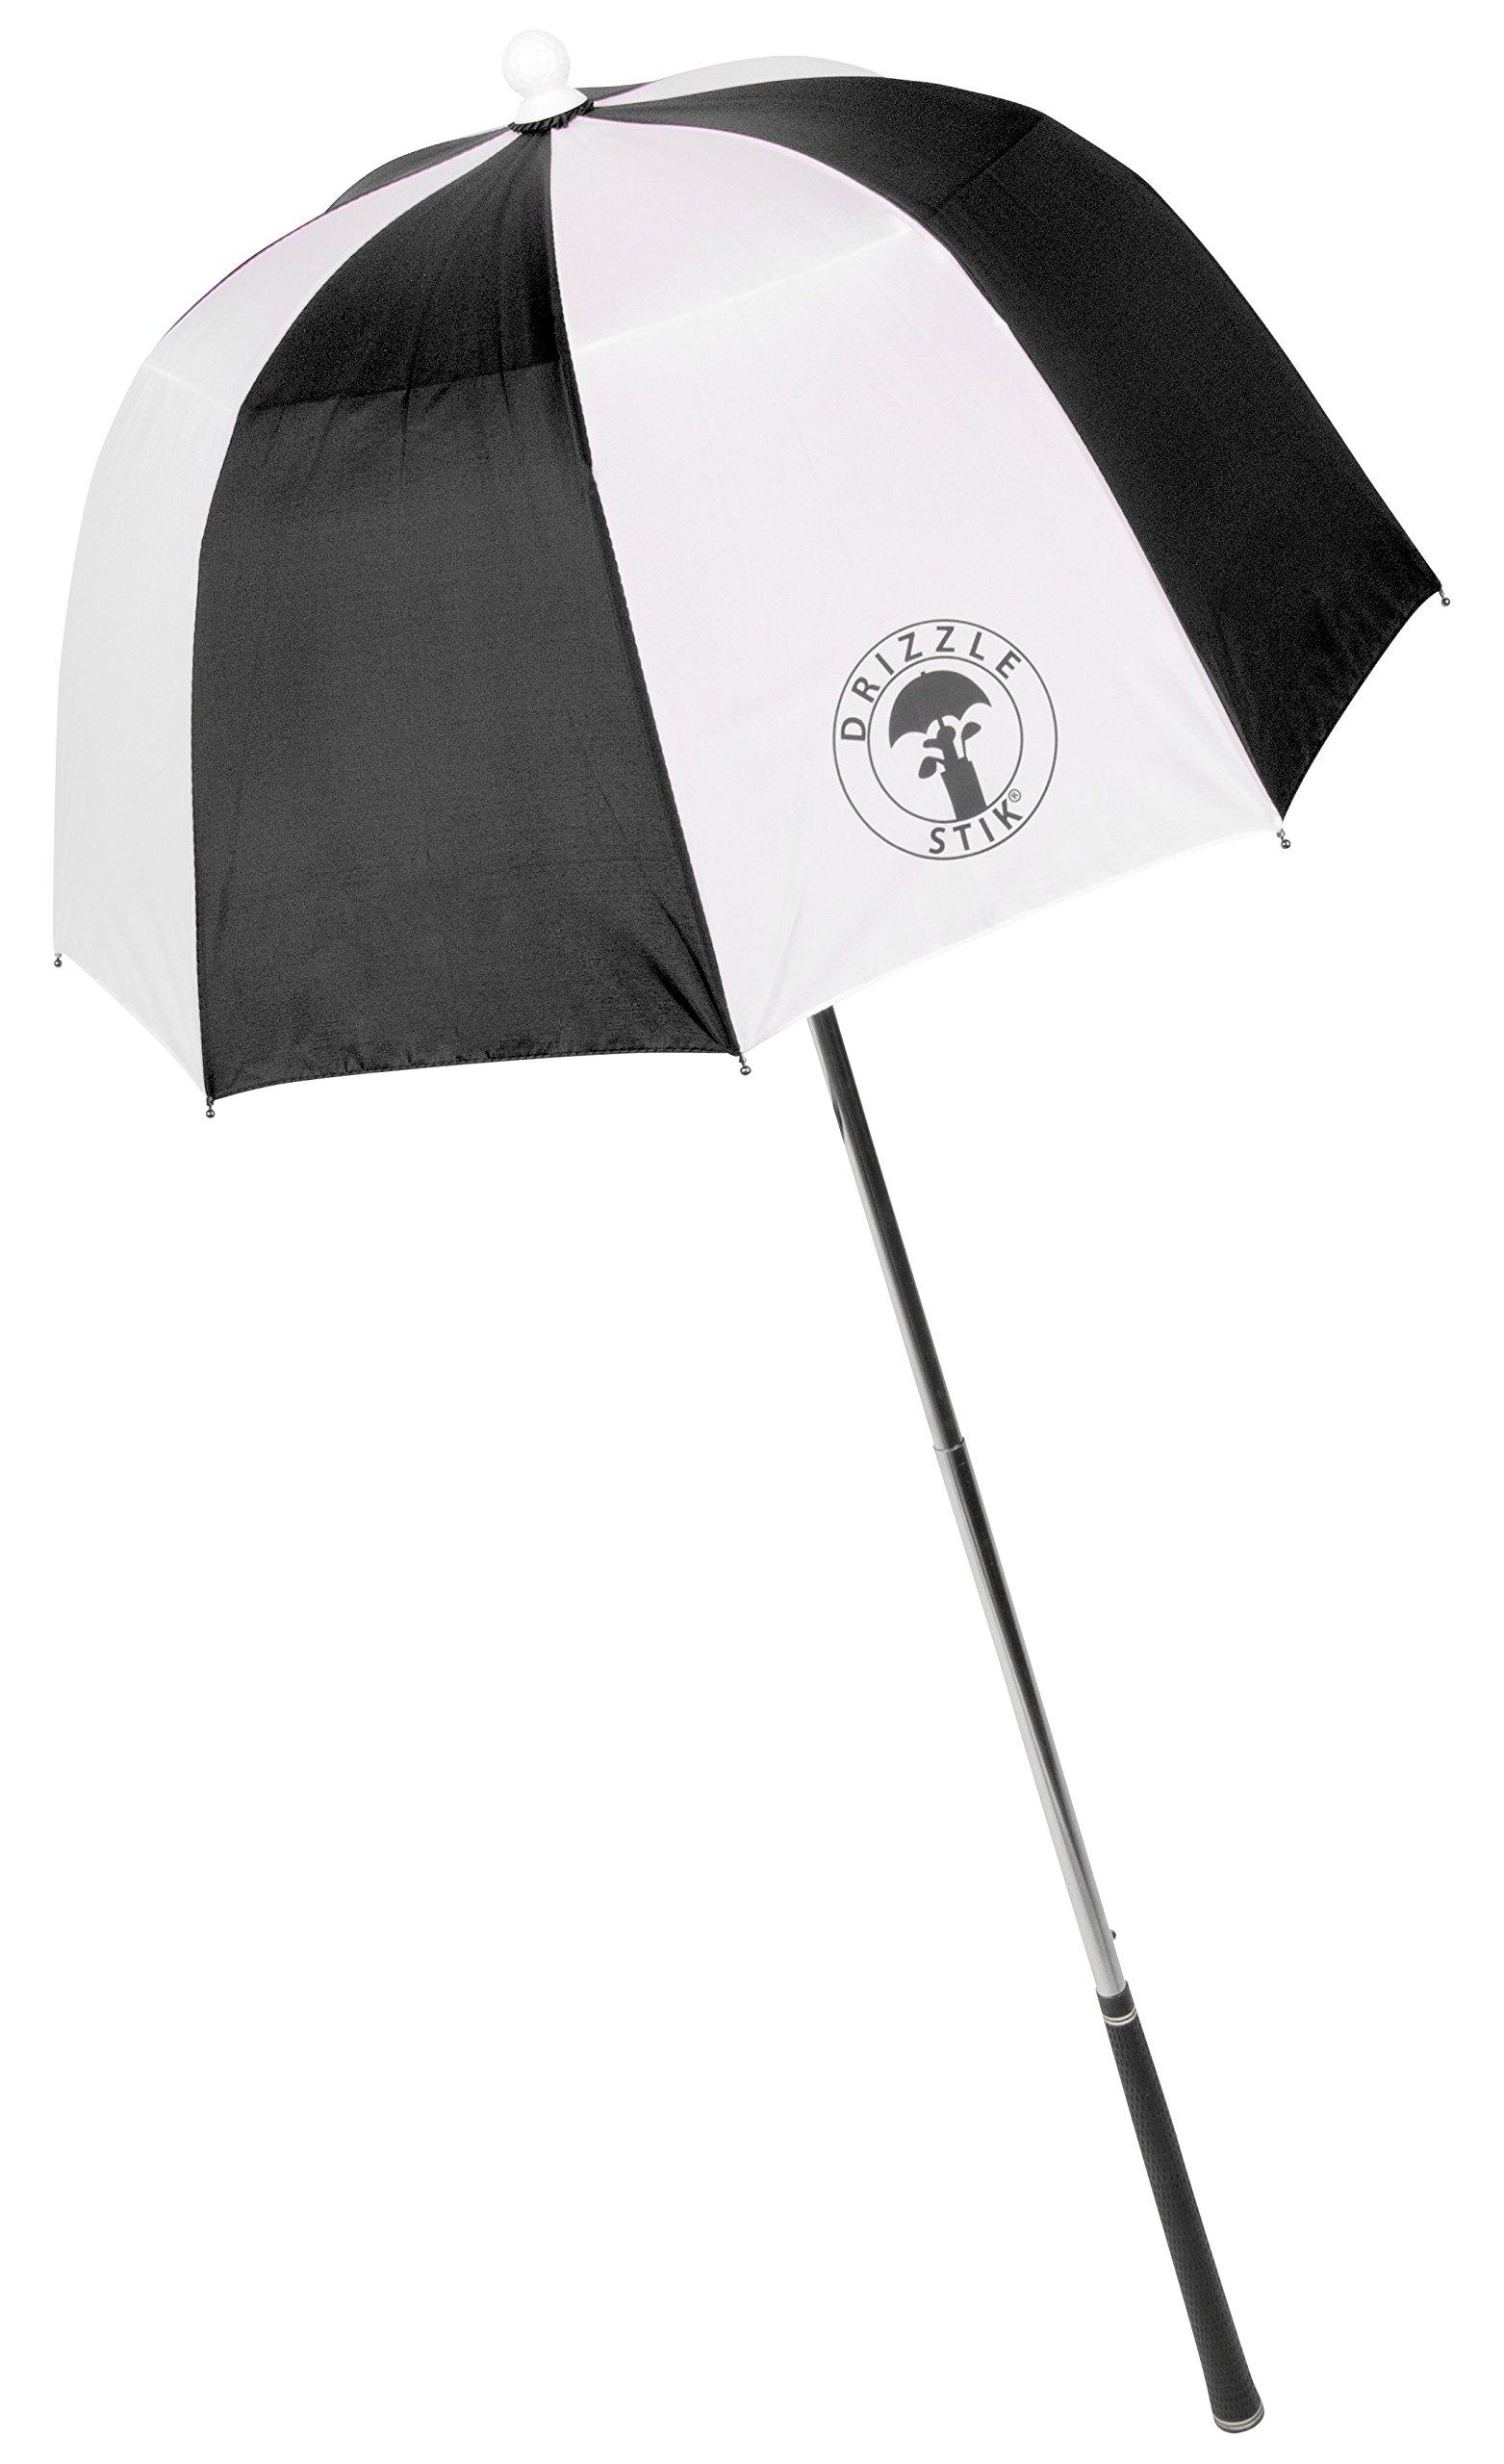 DrizzleStik Flex - Golf Club Umbrella (Black/White) by Drizzle Stik